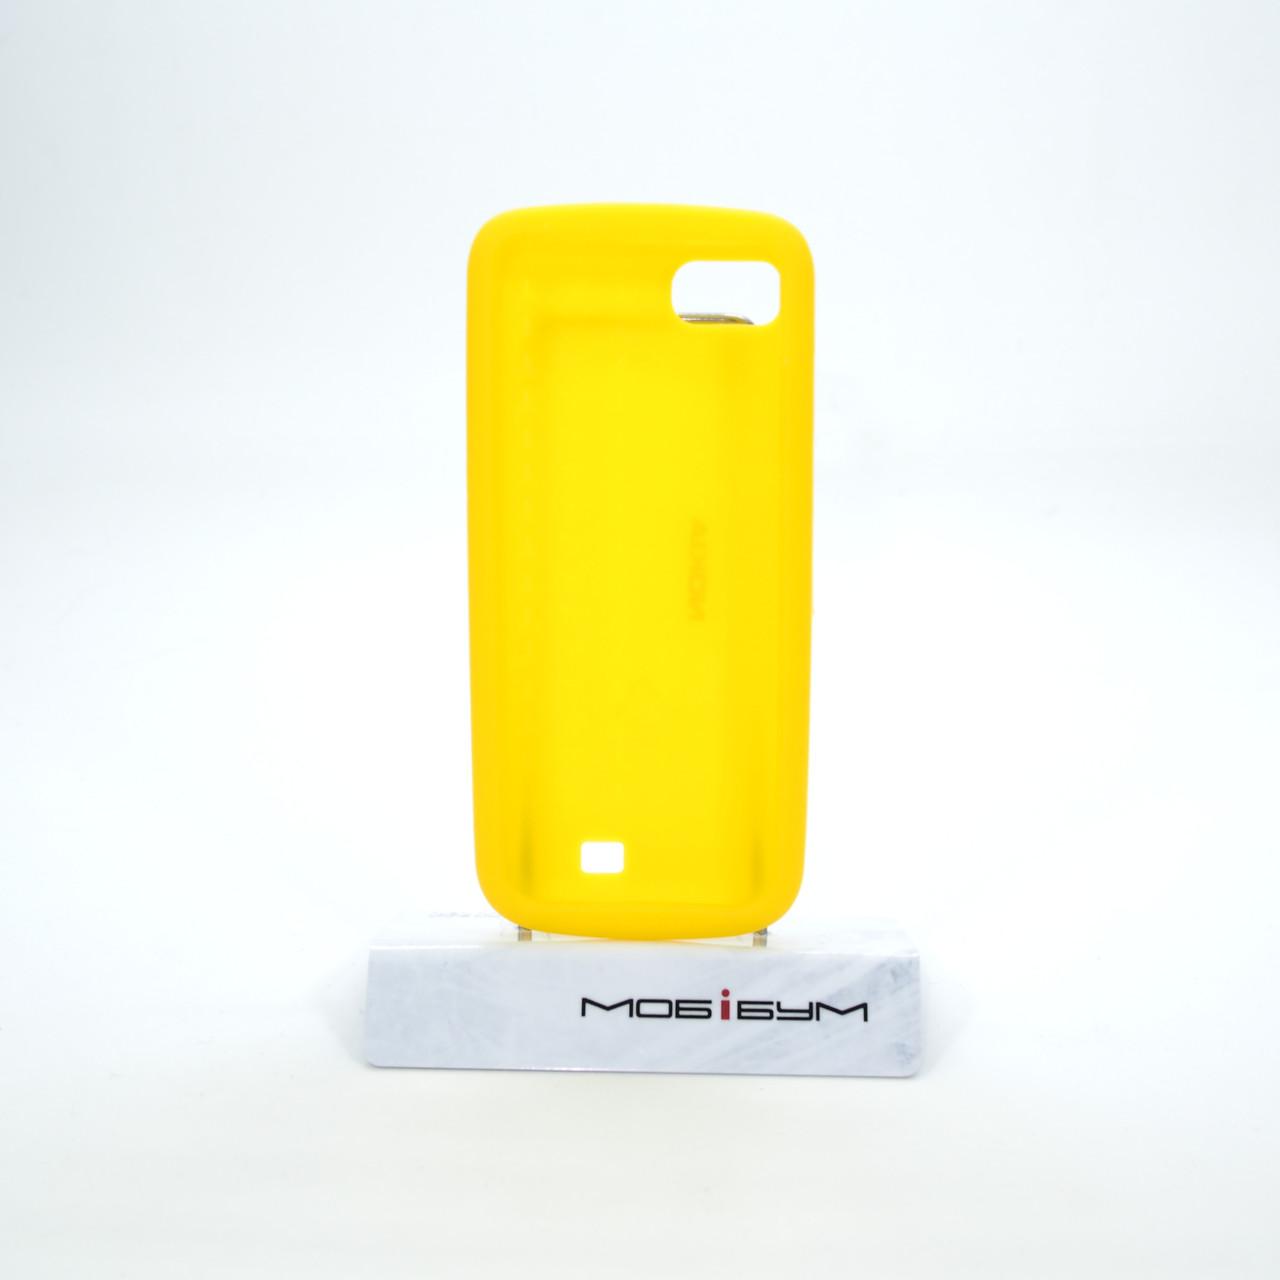 Чехлы для Nokia CC-1014 C3-01 Silicone Cover yellow